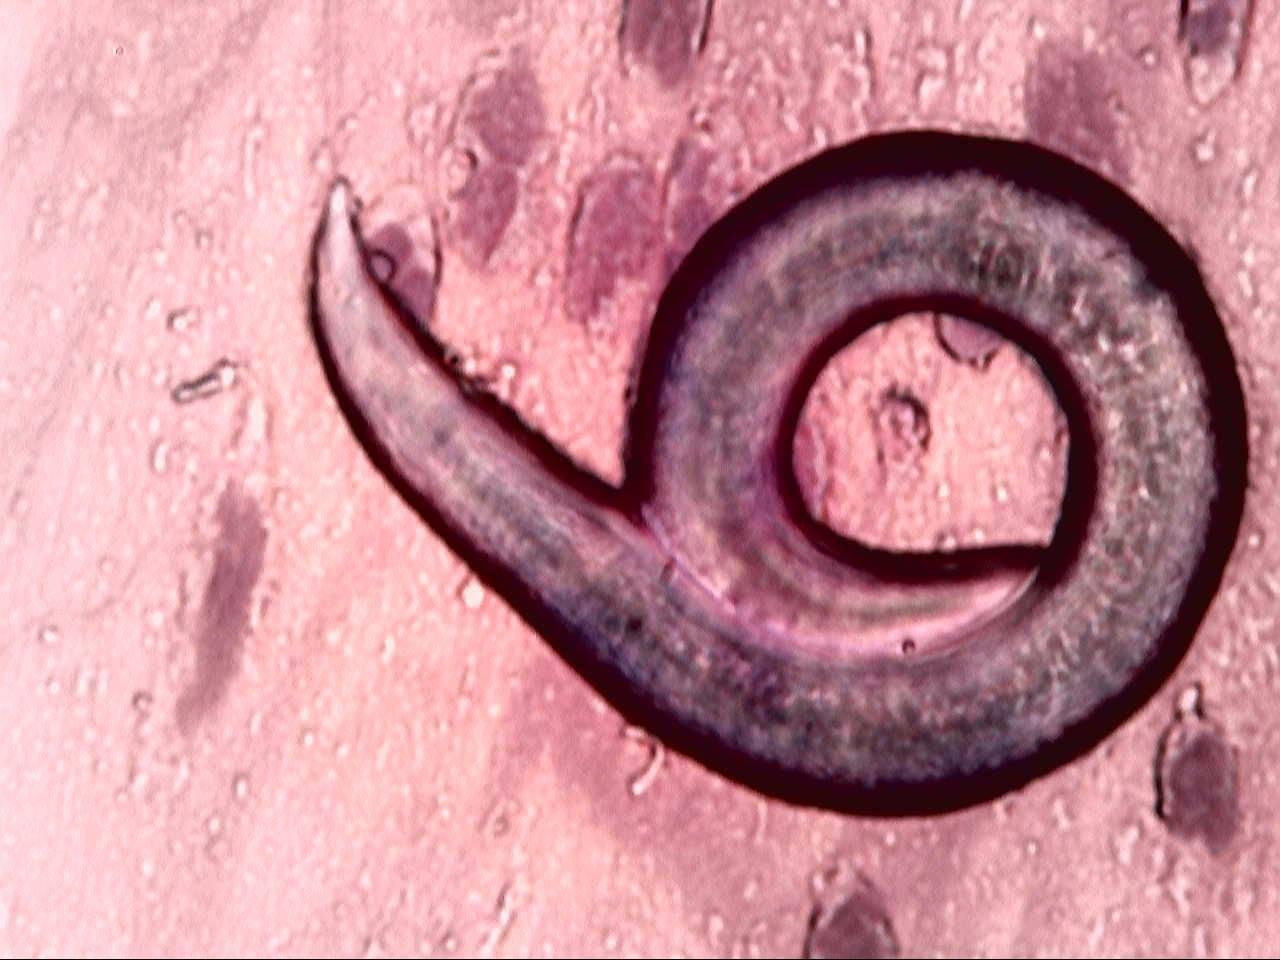 vierme cilindric parazit